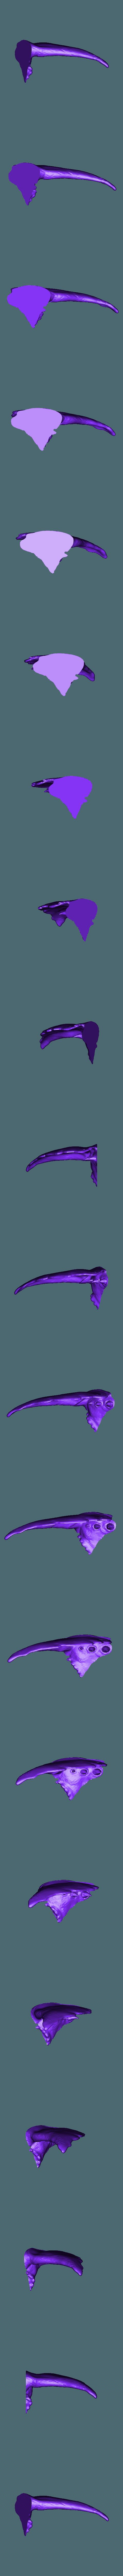 GADGETs head  pt5.stl Download free STL file GADGET the robotic Gremlin • 3D printing object, atarka3